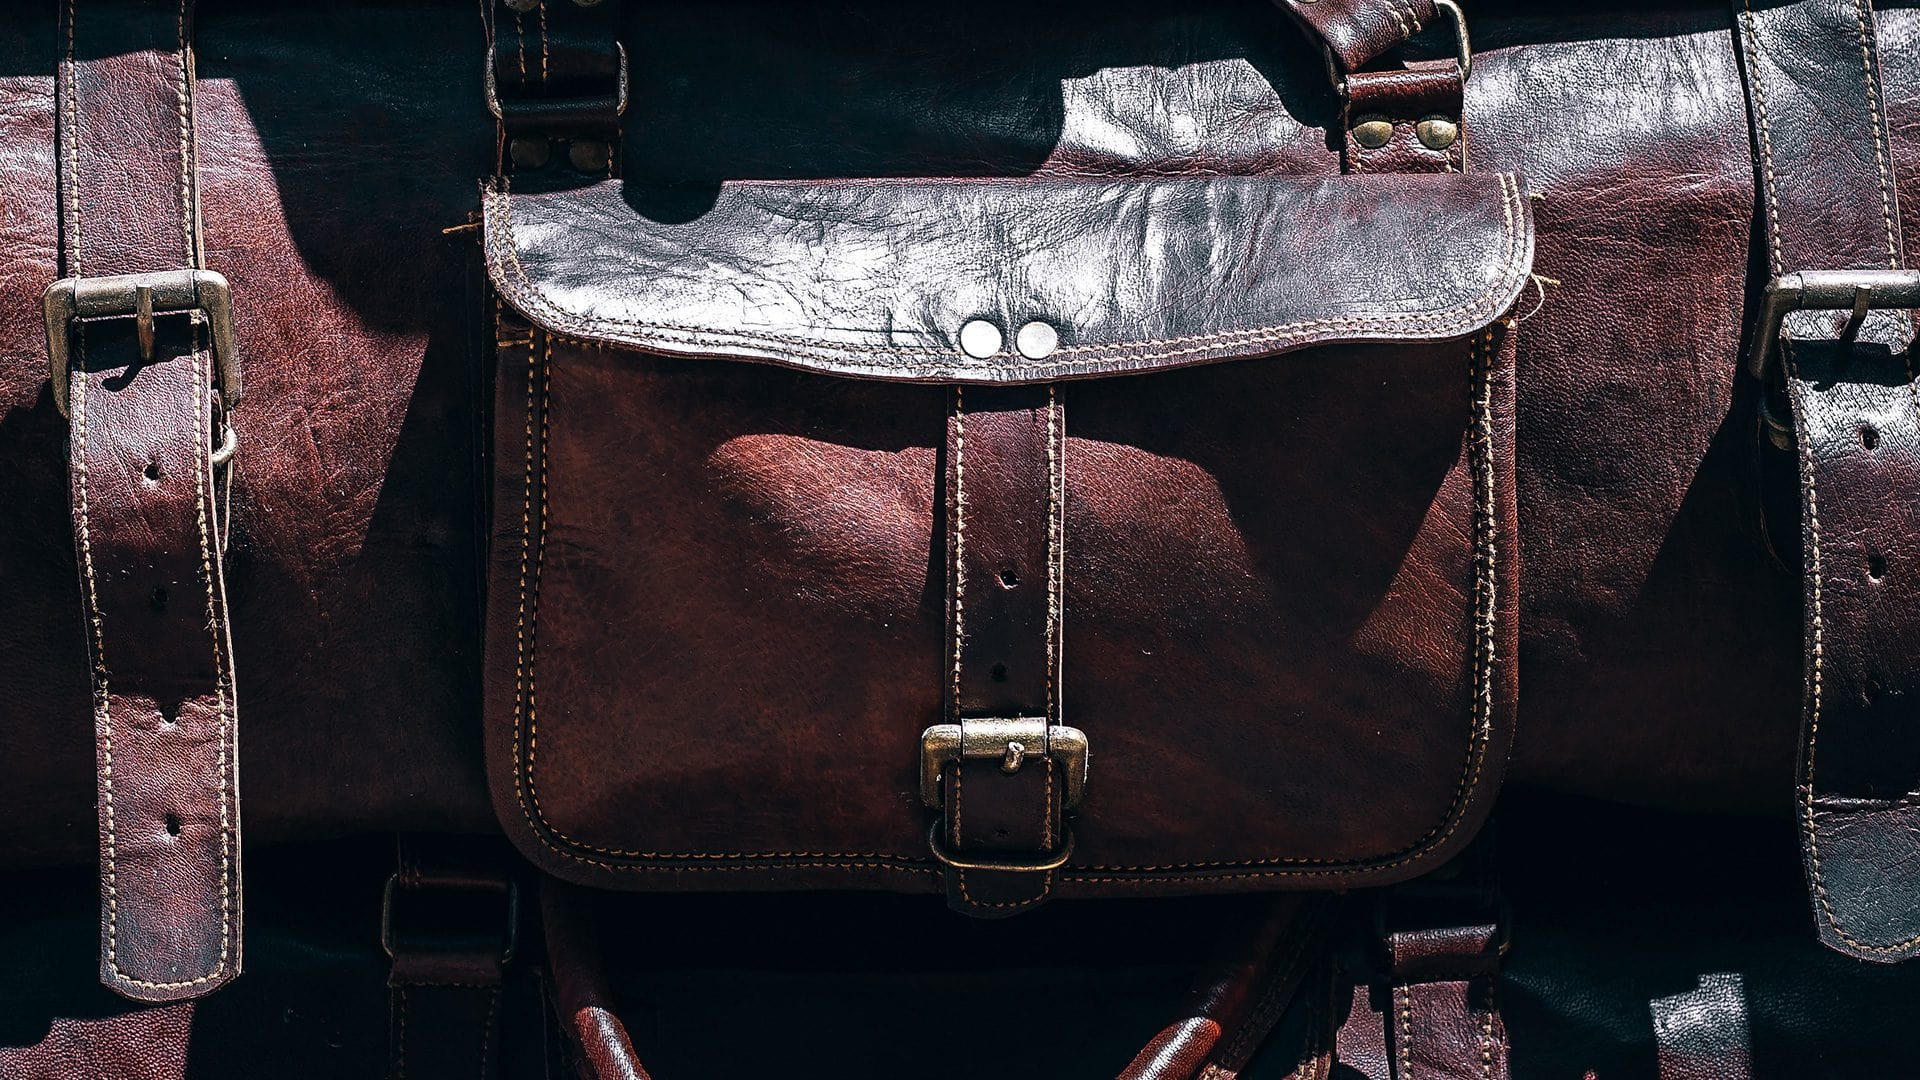 Medidas equipaje de mano | Rojo Cangrejo Blog de Viajes